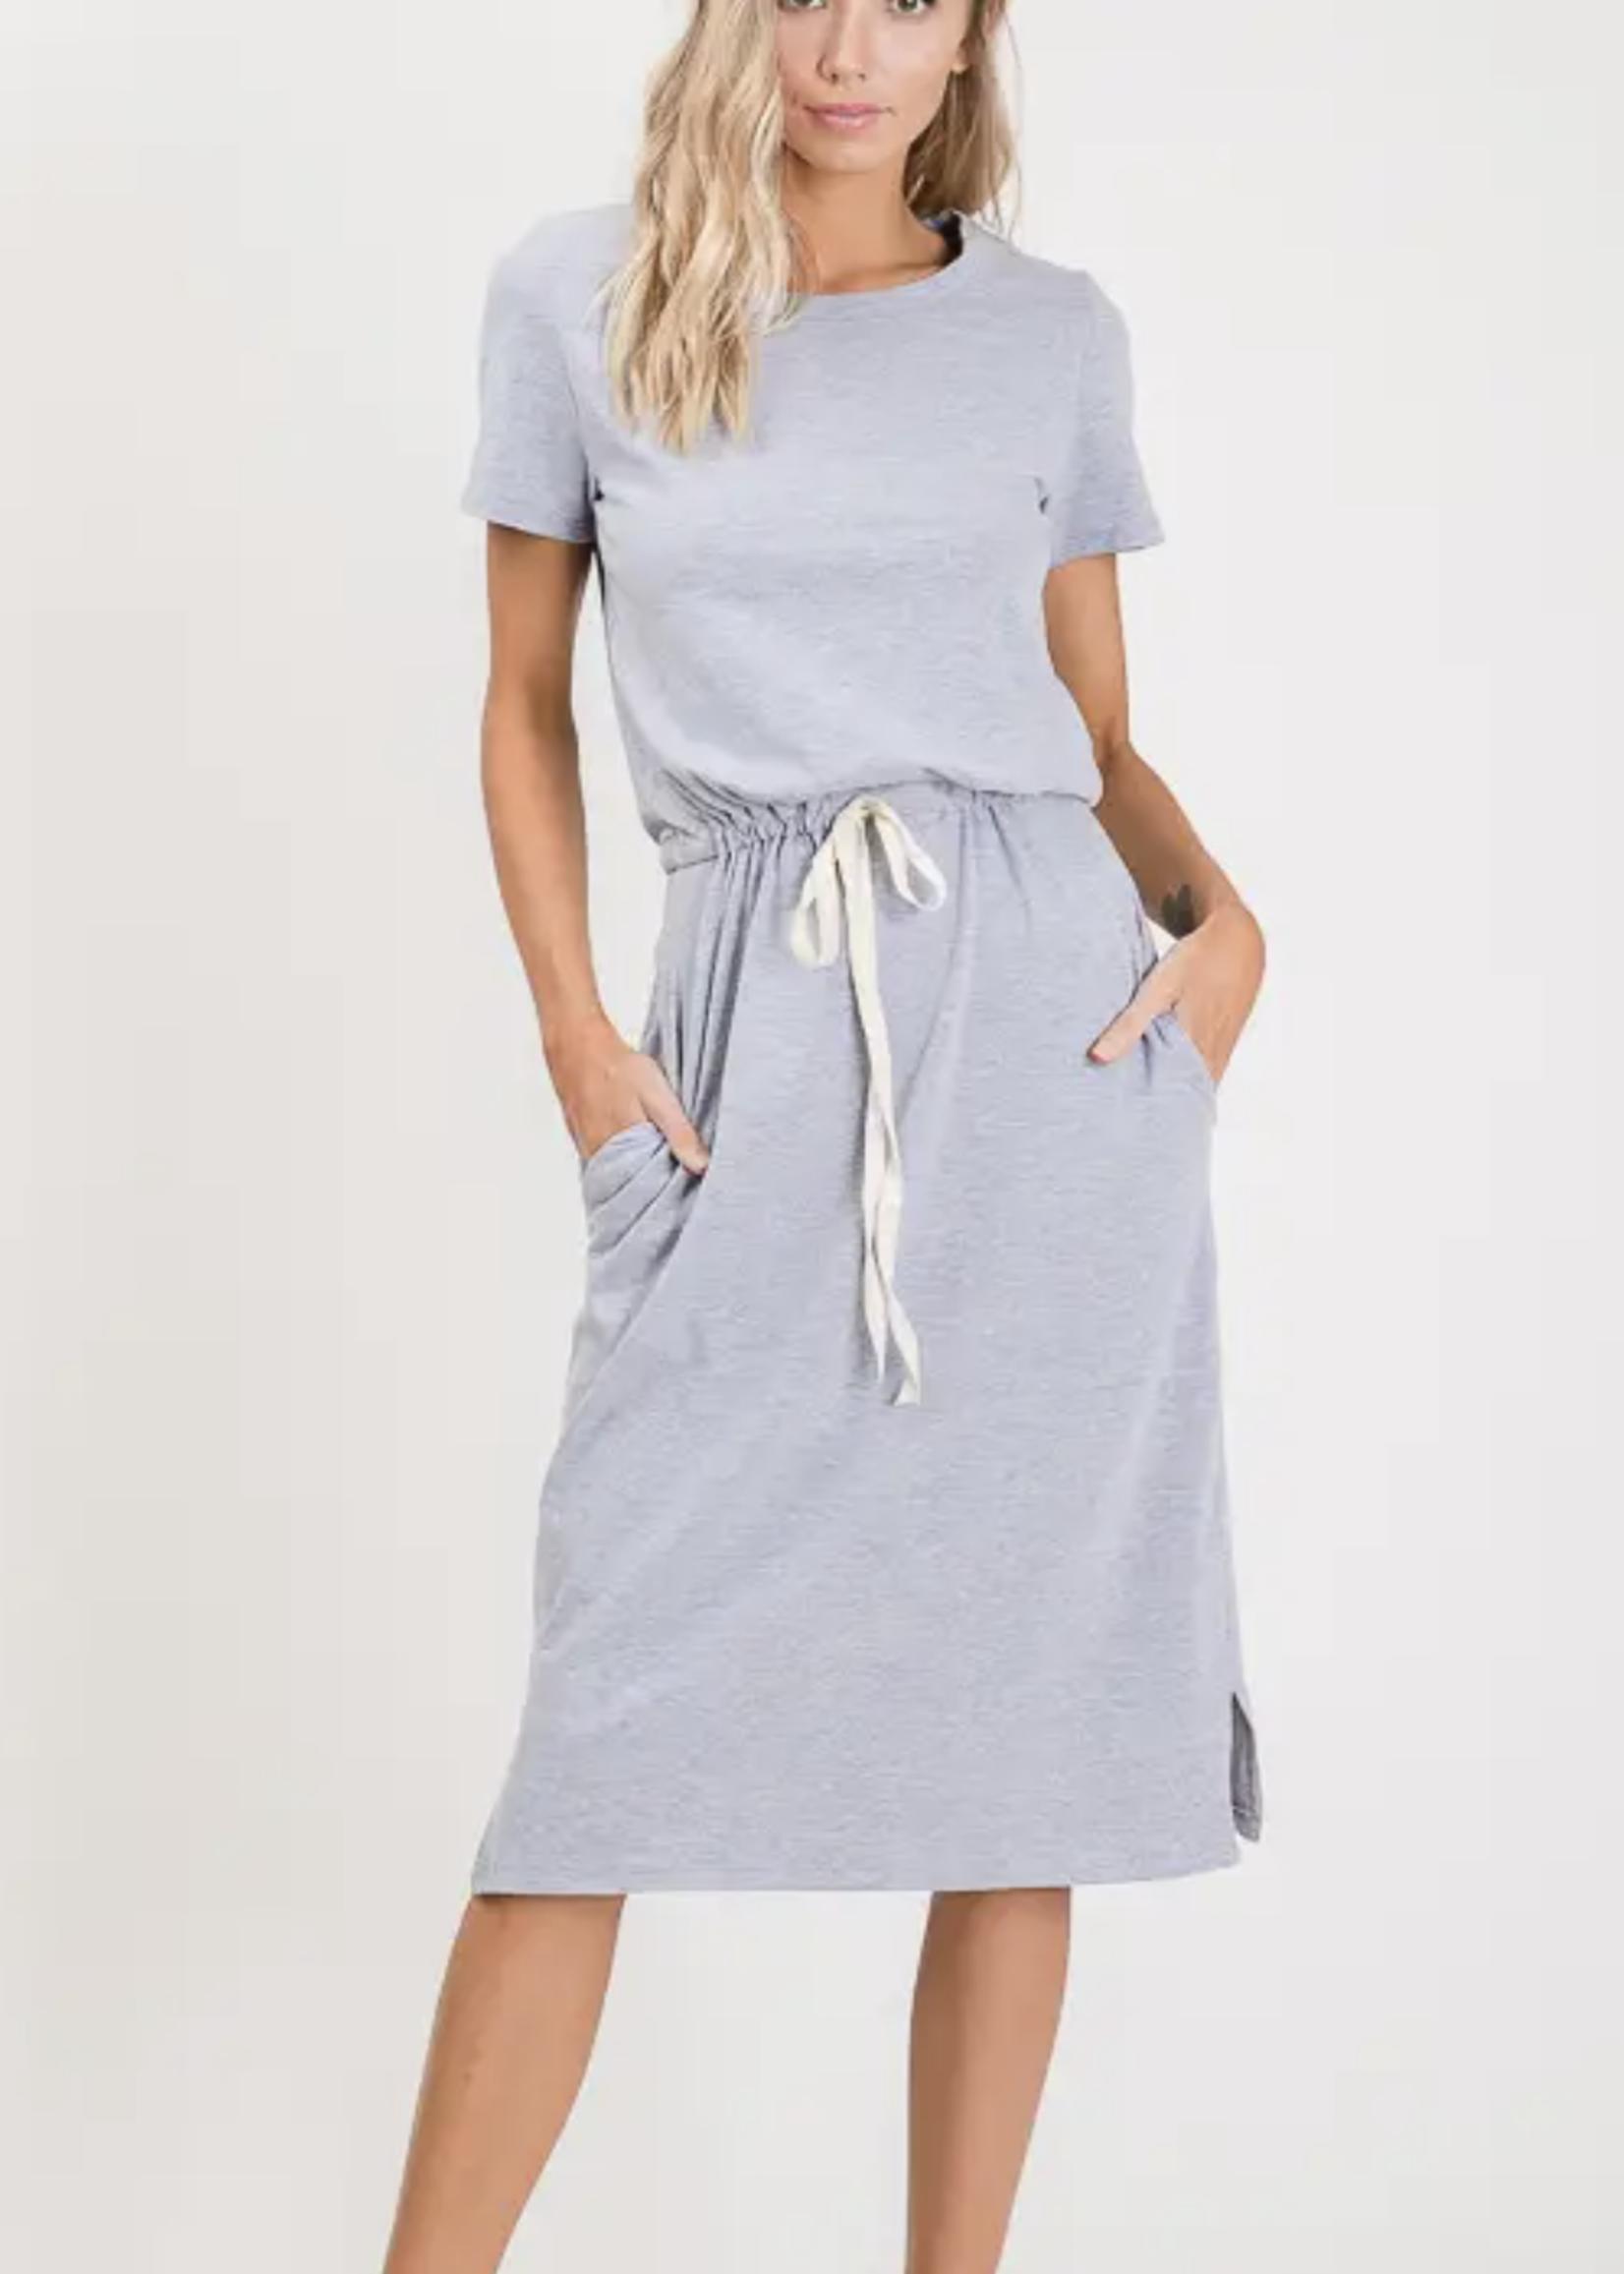 Cotton Drawstring Dress